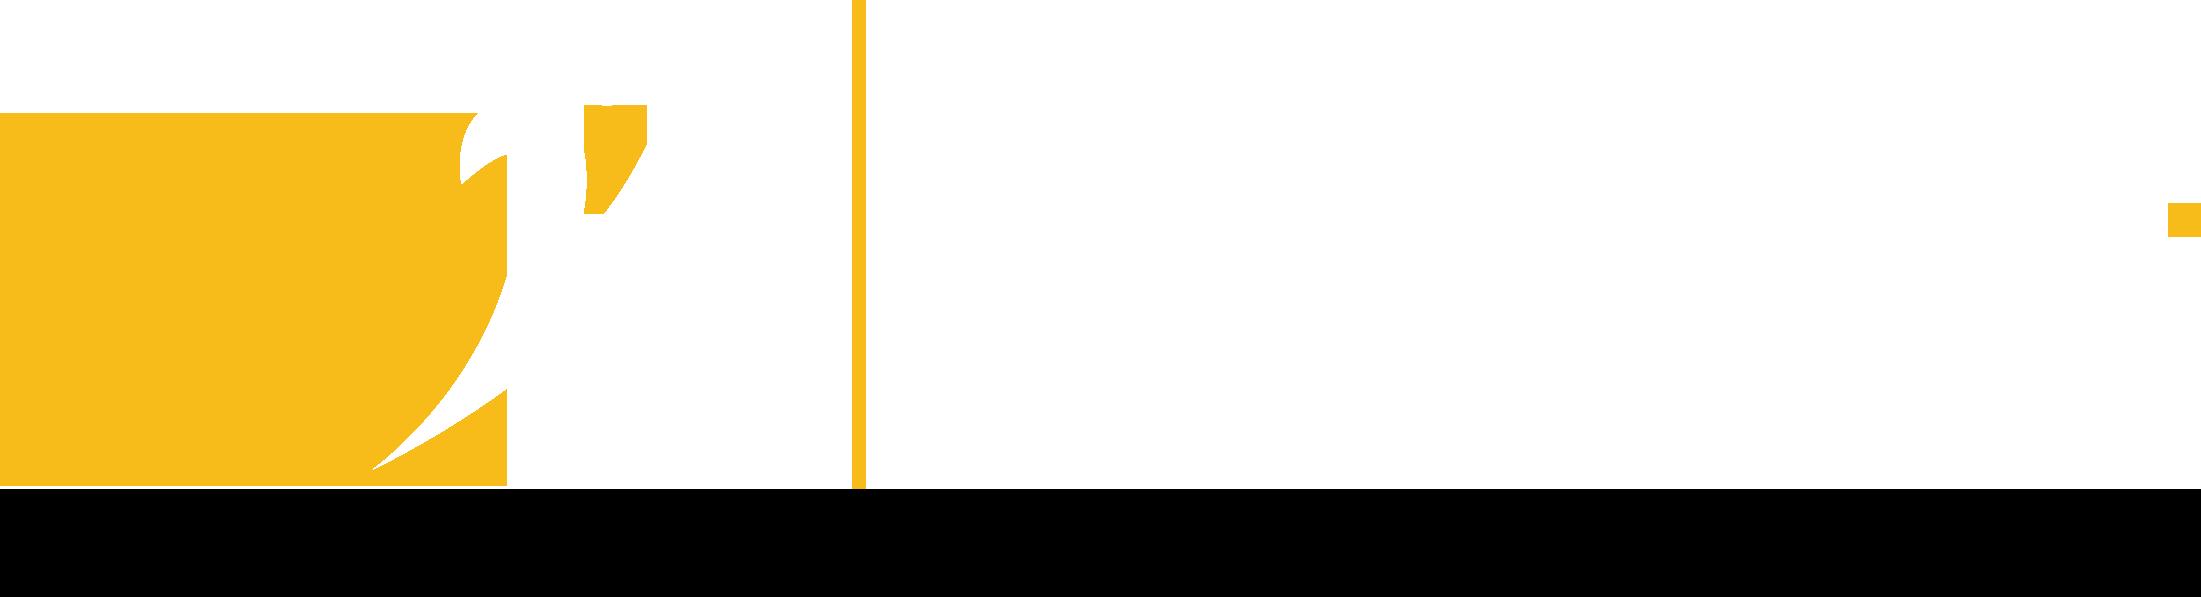 https://campaign-image.eu/zohocampaigns/71975000000266032_zc_v33_1615749999175_fokus_msp_logo_weiß_gelb.png